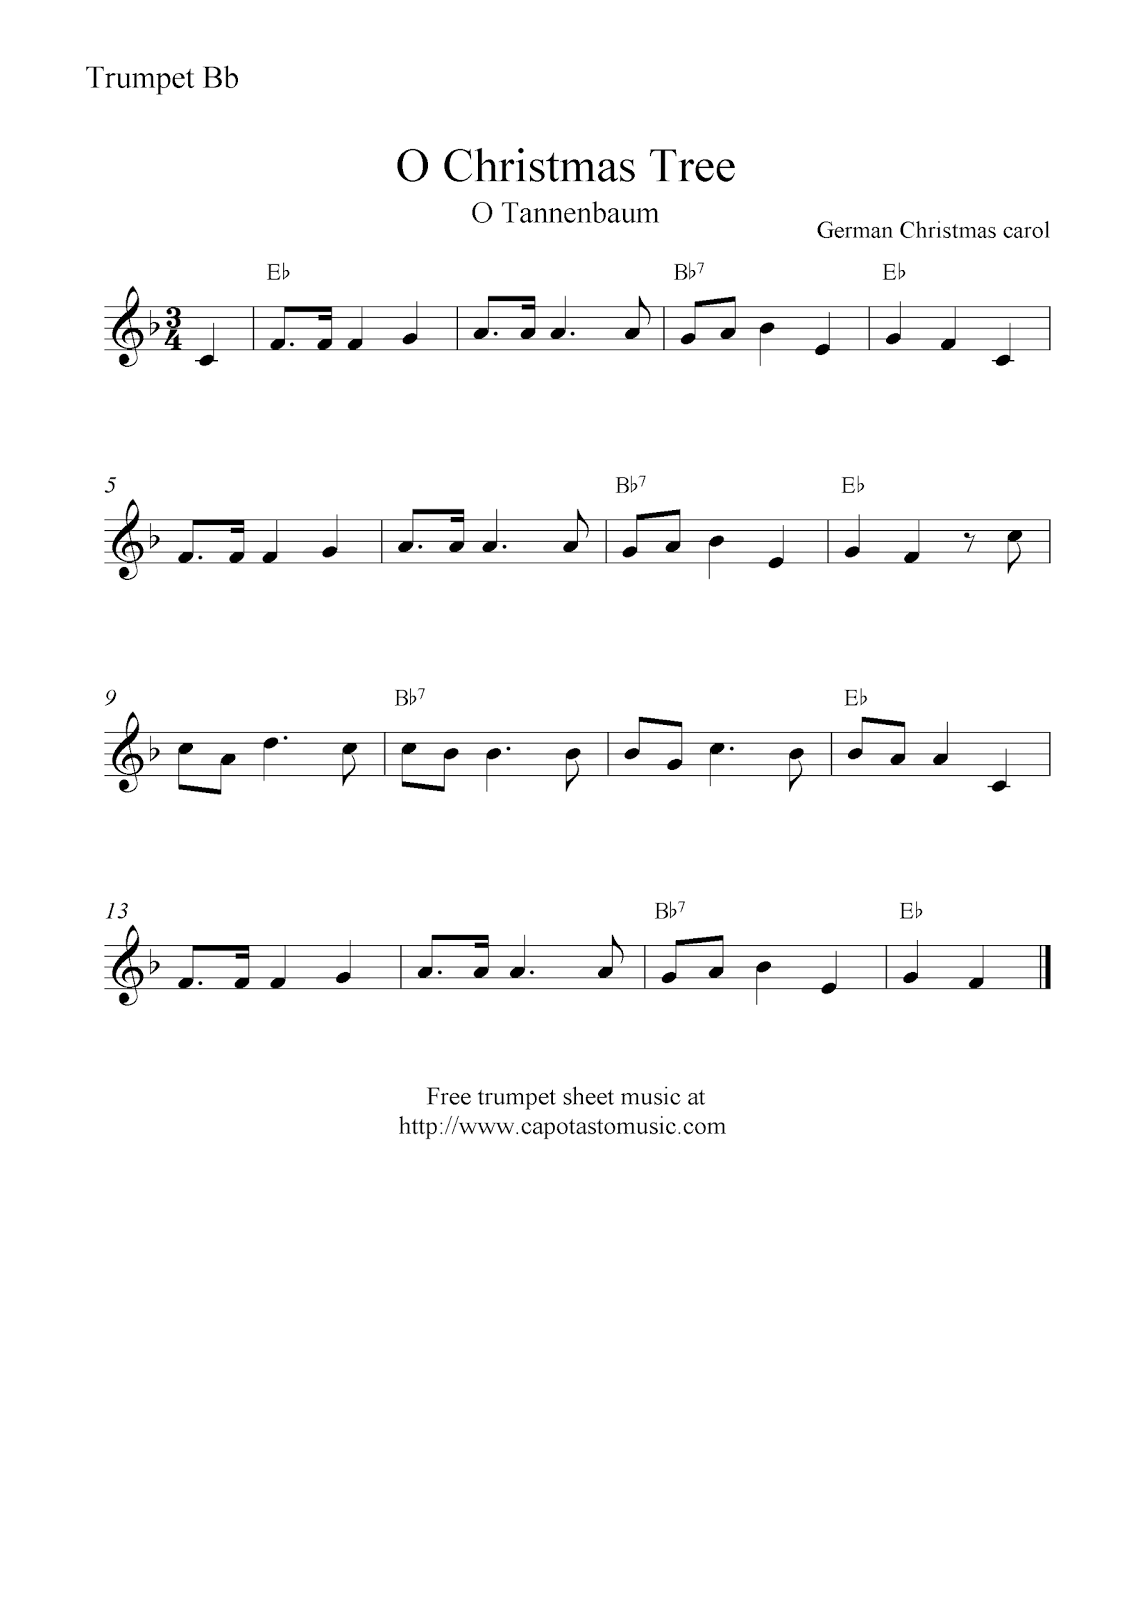 Free Sheet Music Scores O Christmas Tree O Tannenbaum Free Christmas Trumpet Sheet Music Notes Sheet Music Sheet Music Notes Trumpet Sheet Music